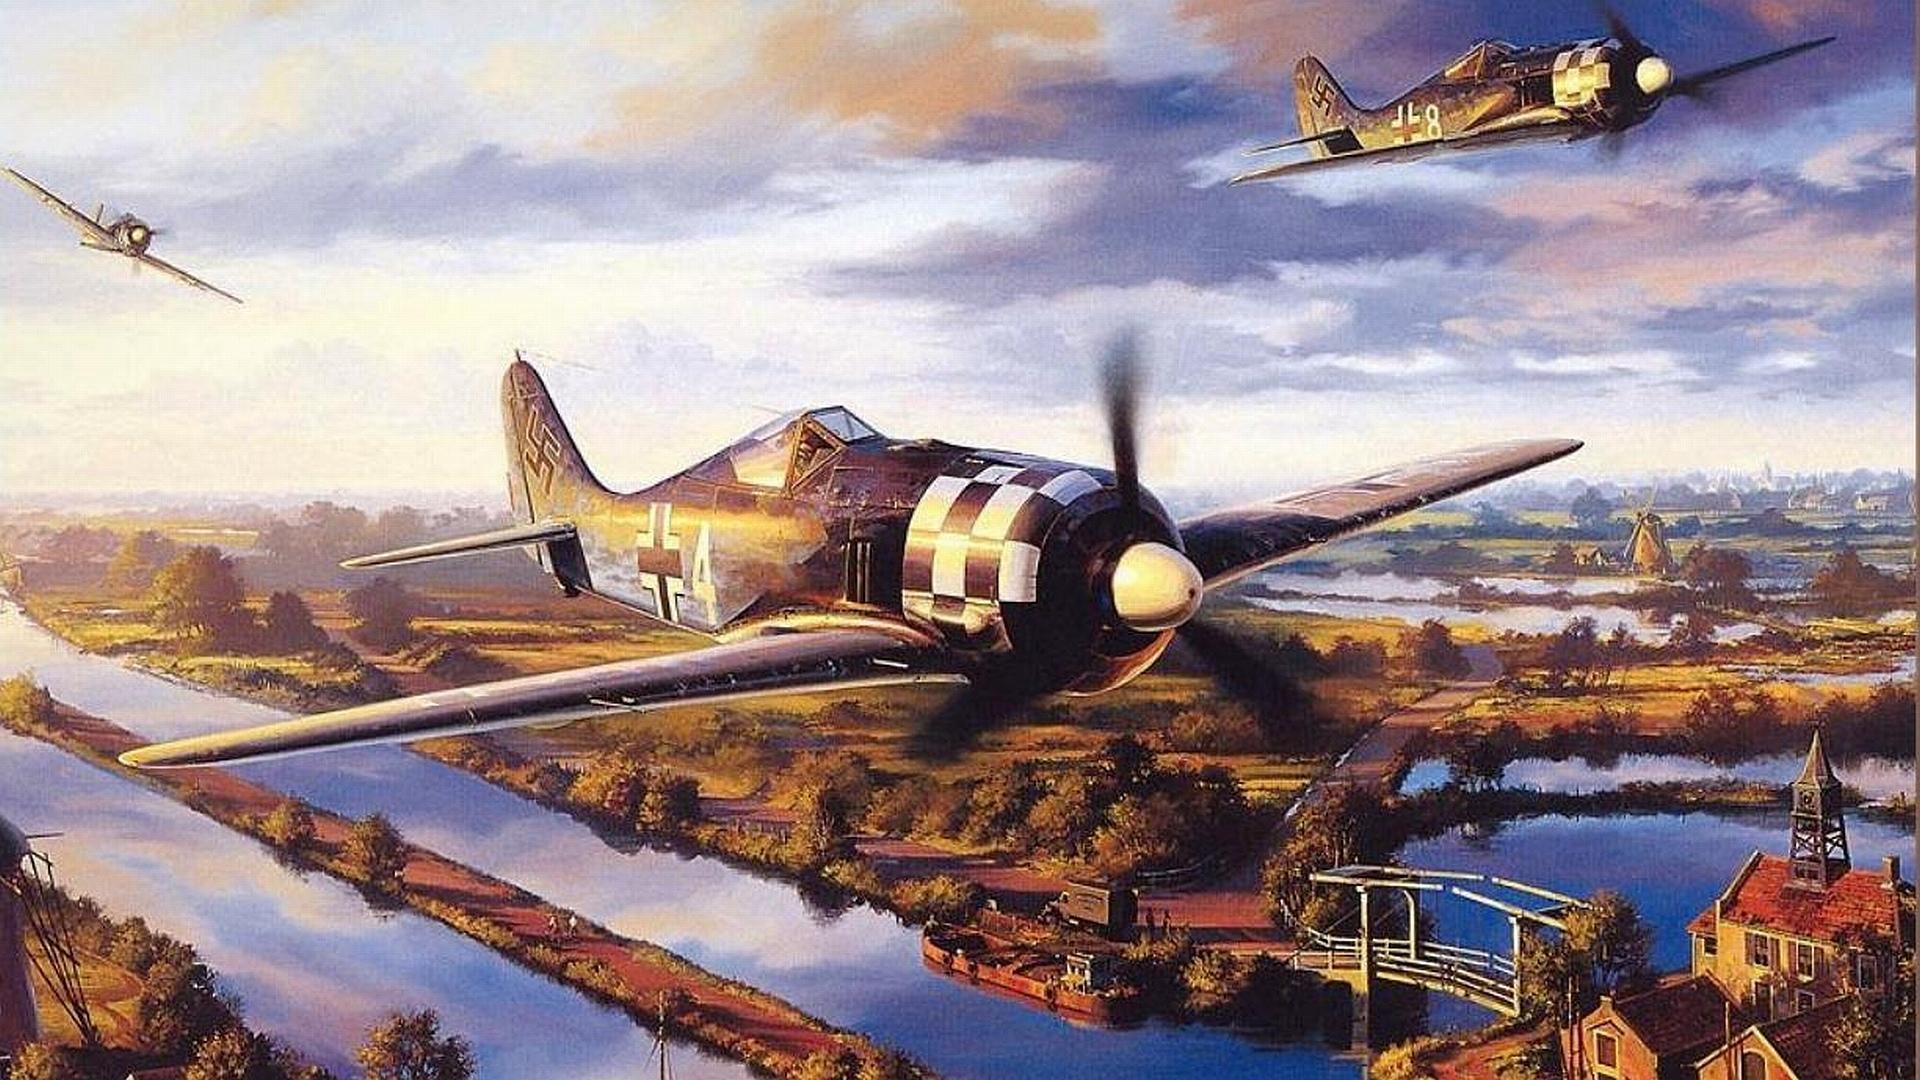 Focke-Wulf Fw 190 wallpapers HD quality